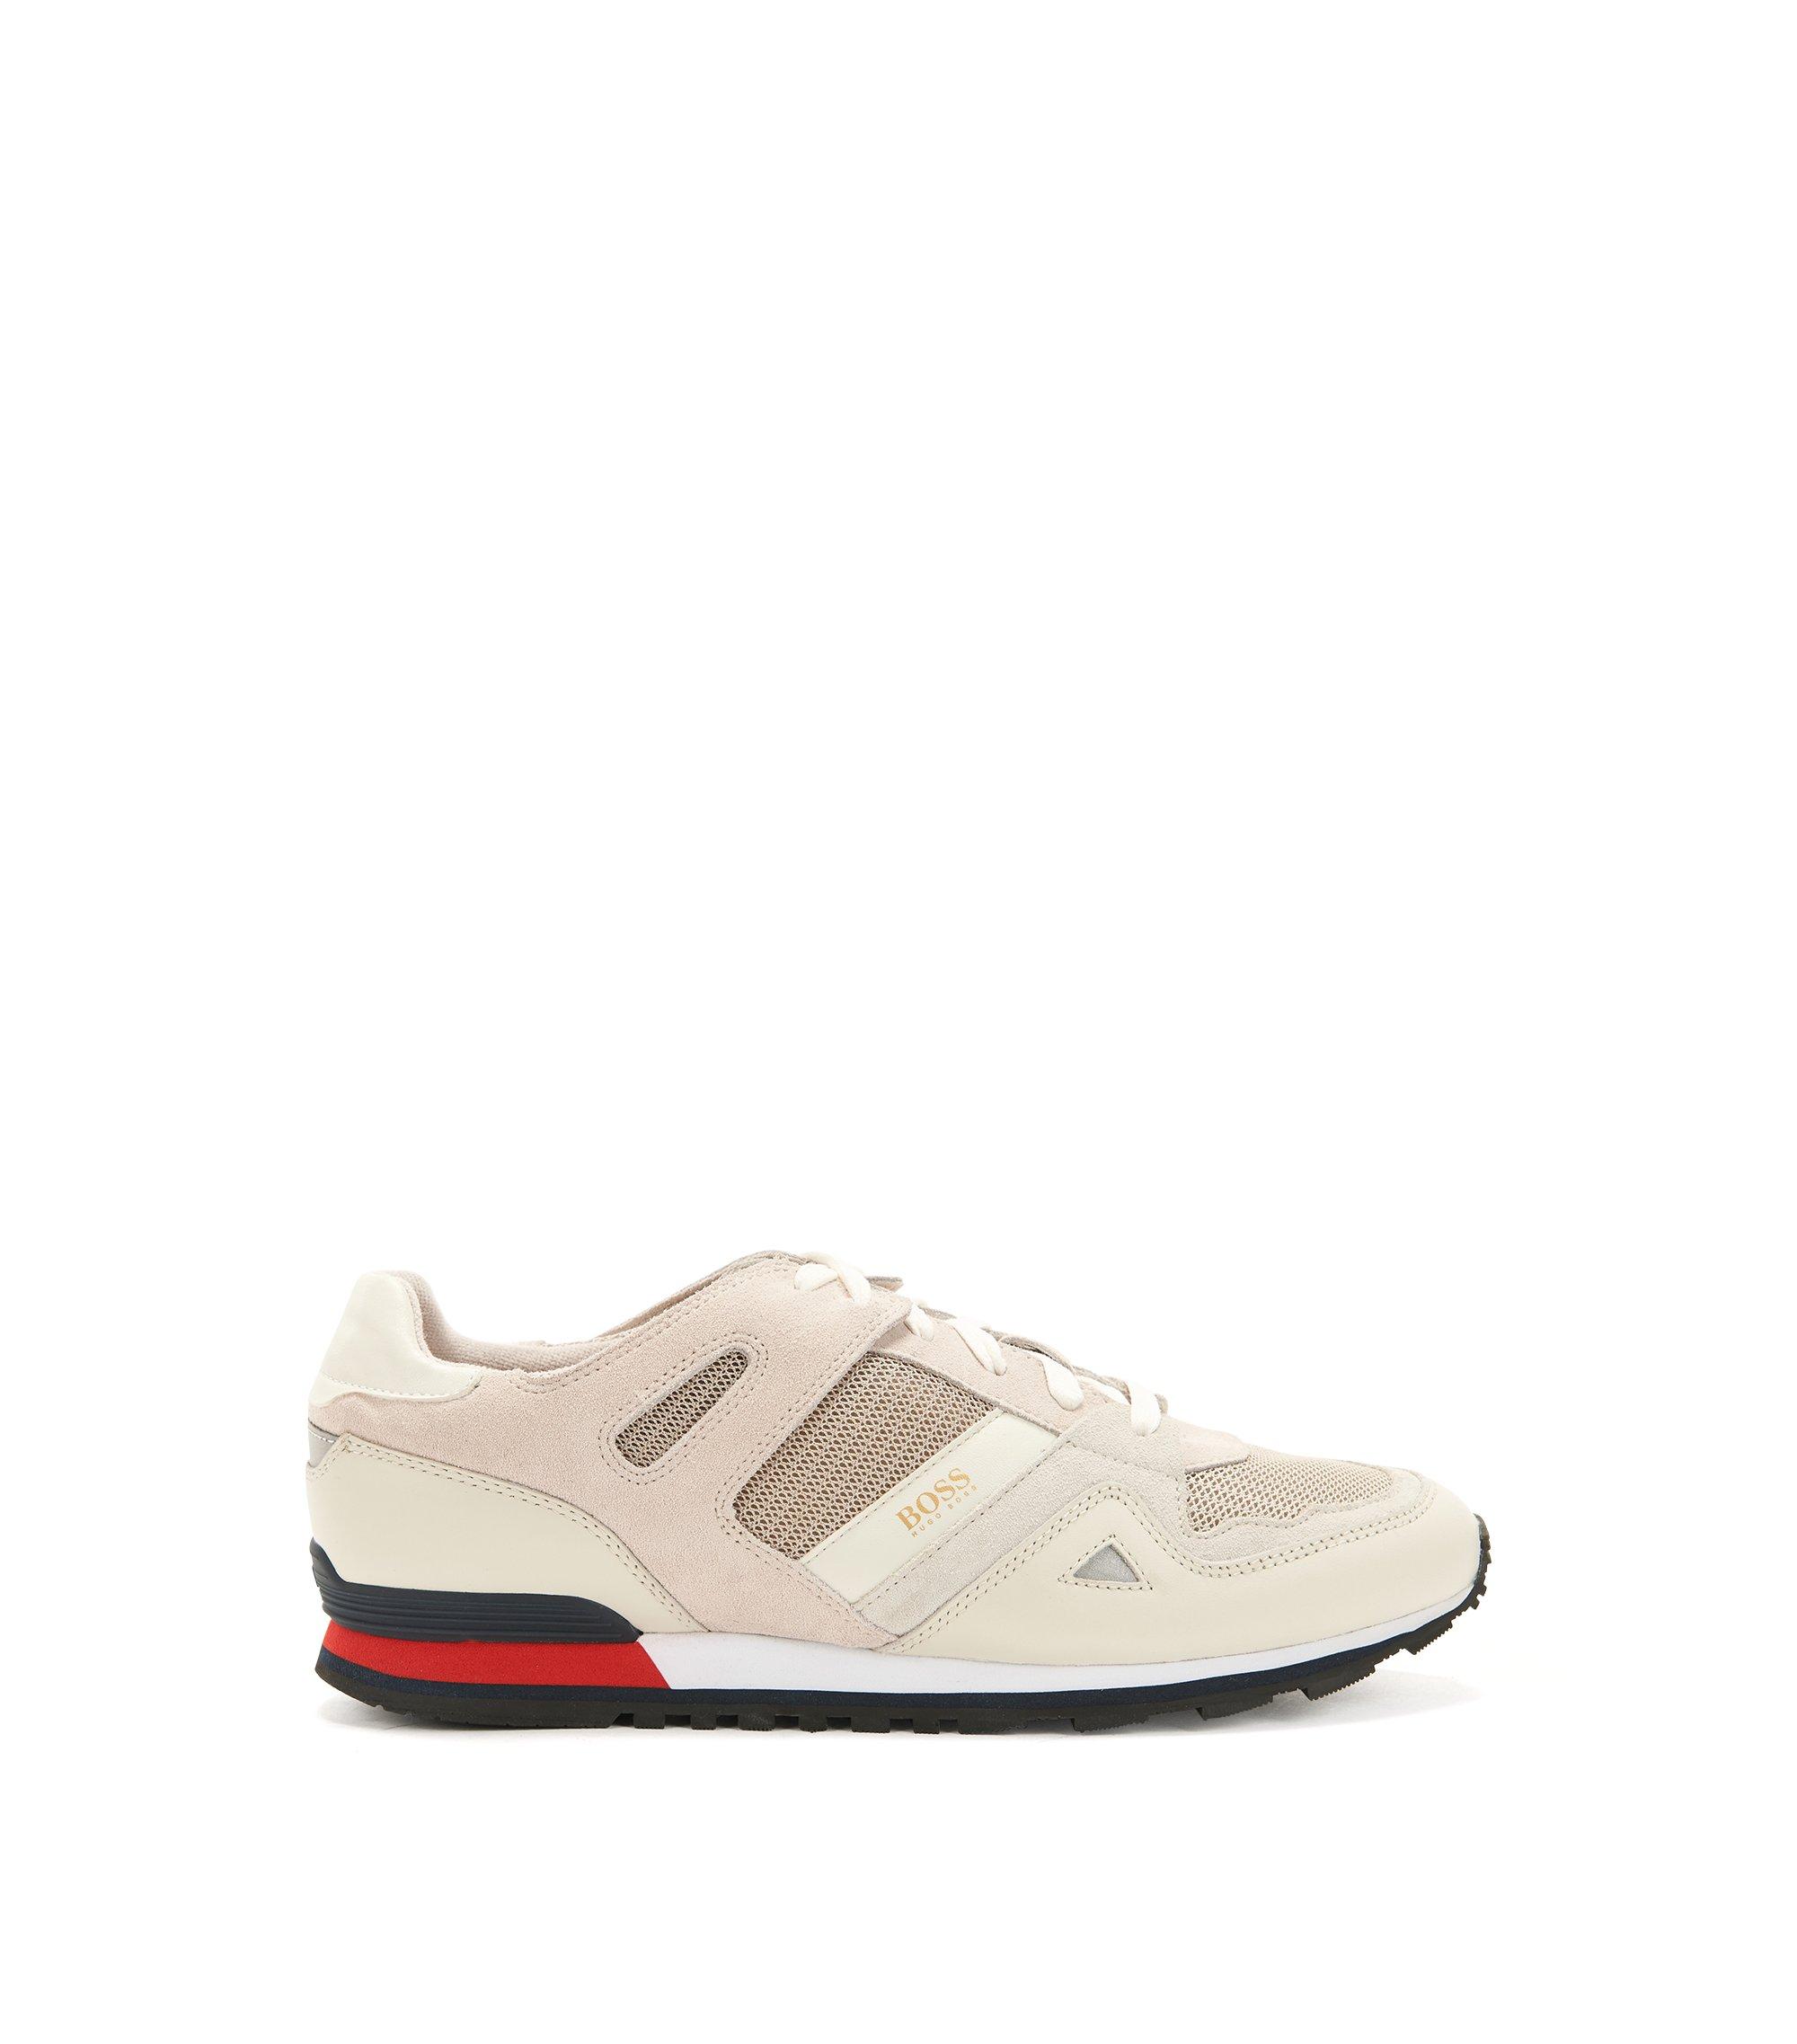 Sneakers aus Material-Mix und Leder, Hellgrau